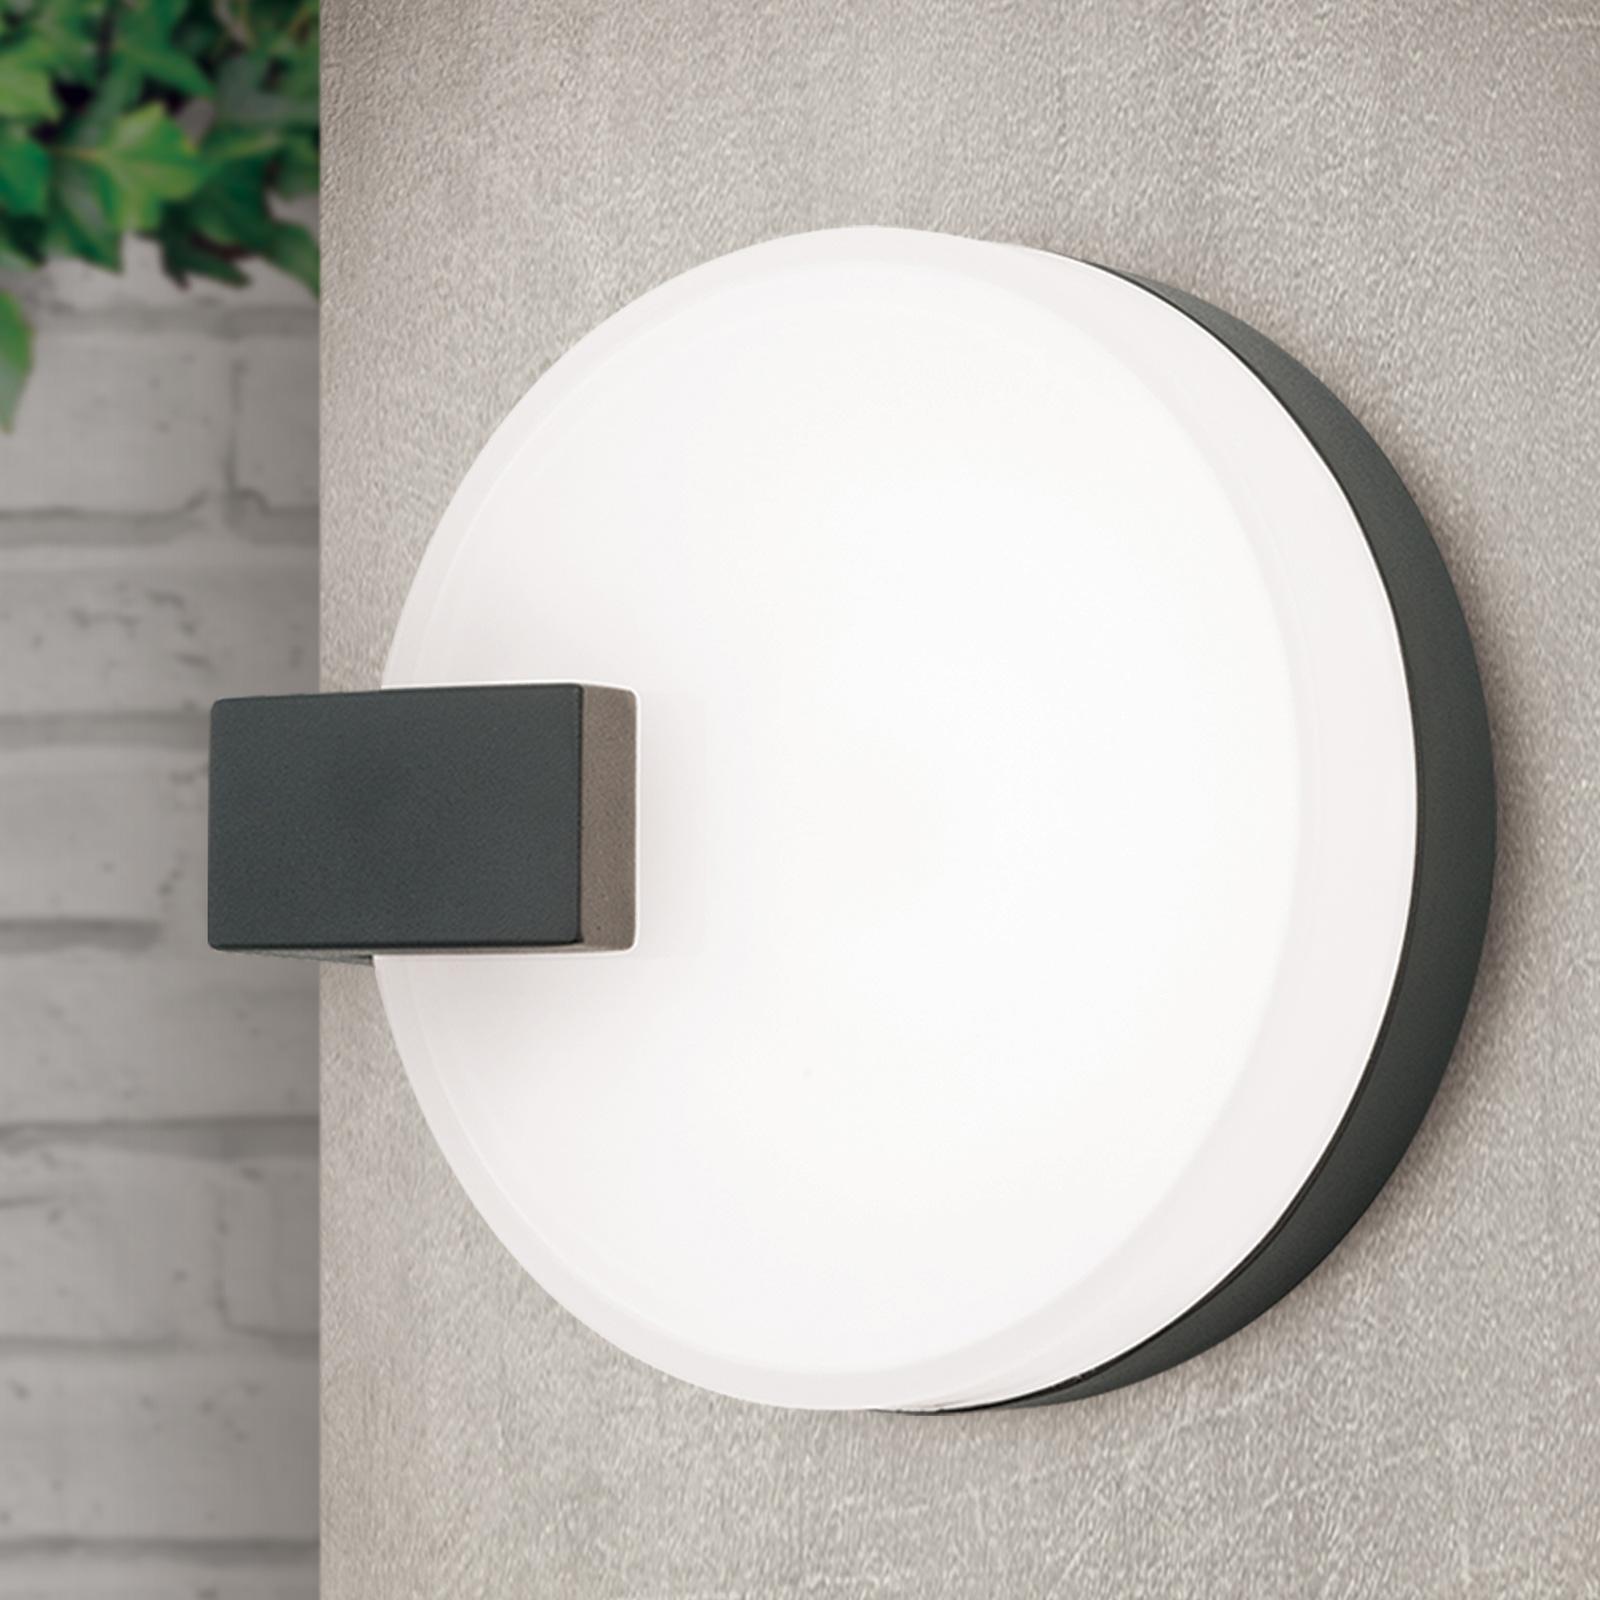 LED buitenwandlamp Astra van gegoten silicium